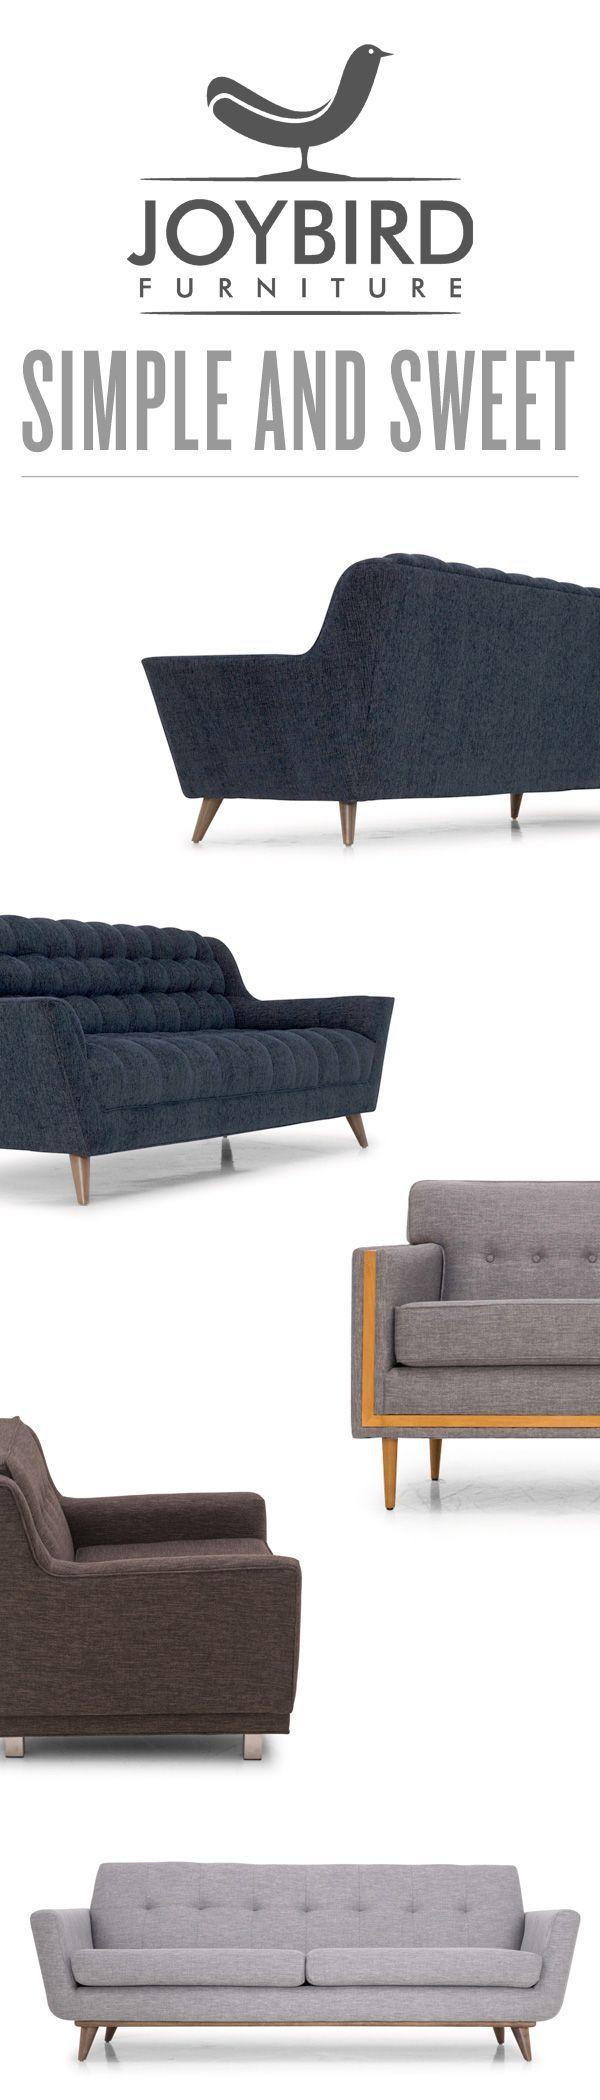 Lazzoni Furniture Houston Instafurnituresus